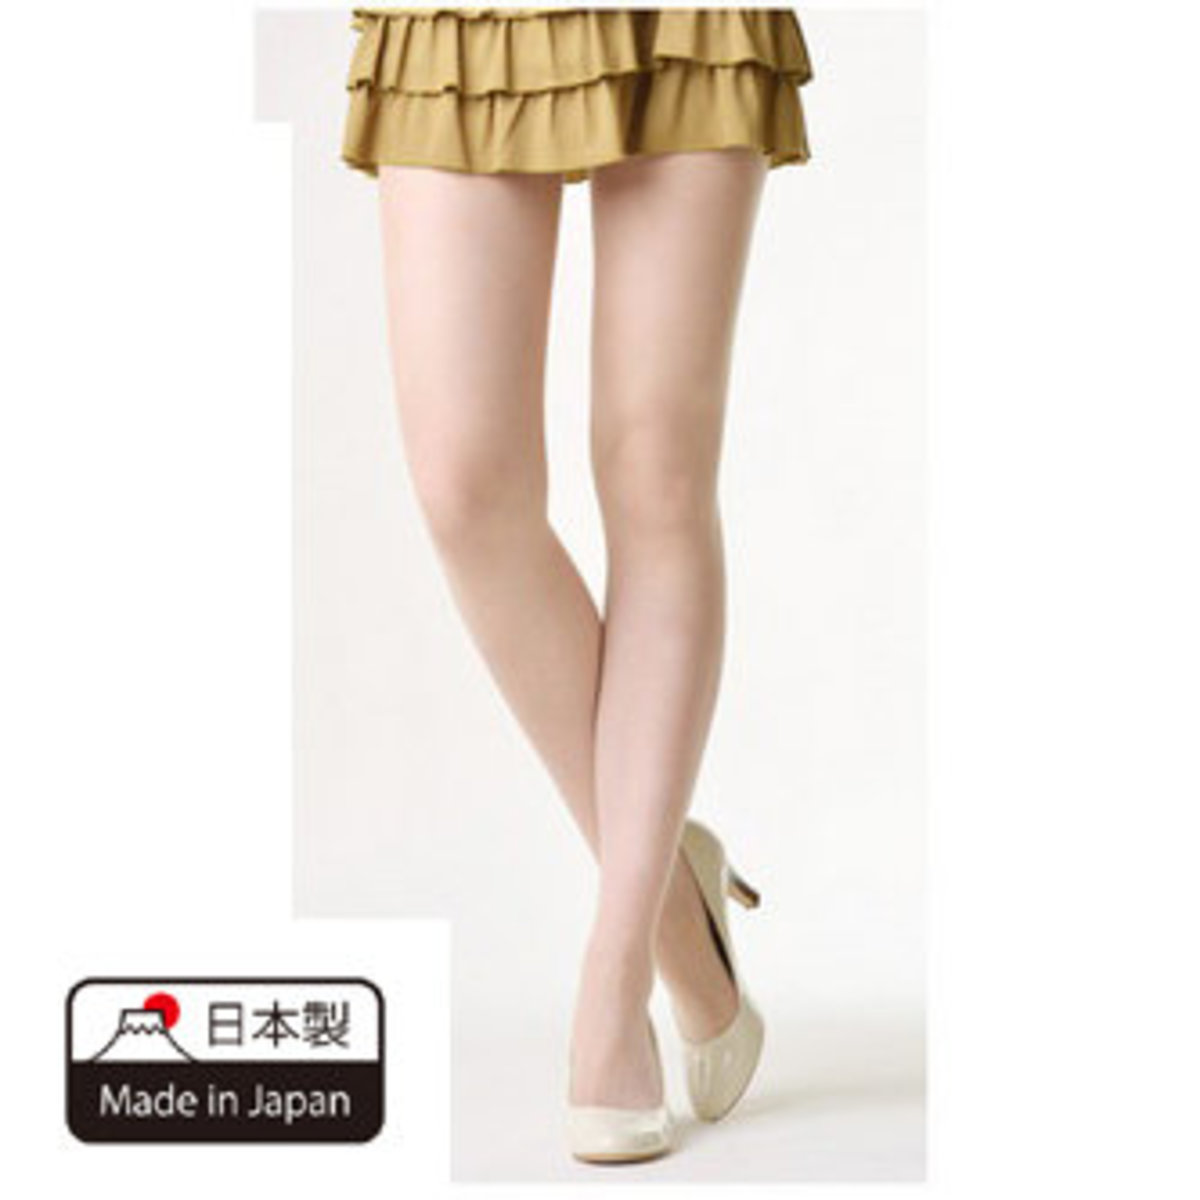 Anti-Hook Stockings (Beige) M-L Antibacterial Anti UV Antistatic (1pc)